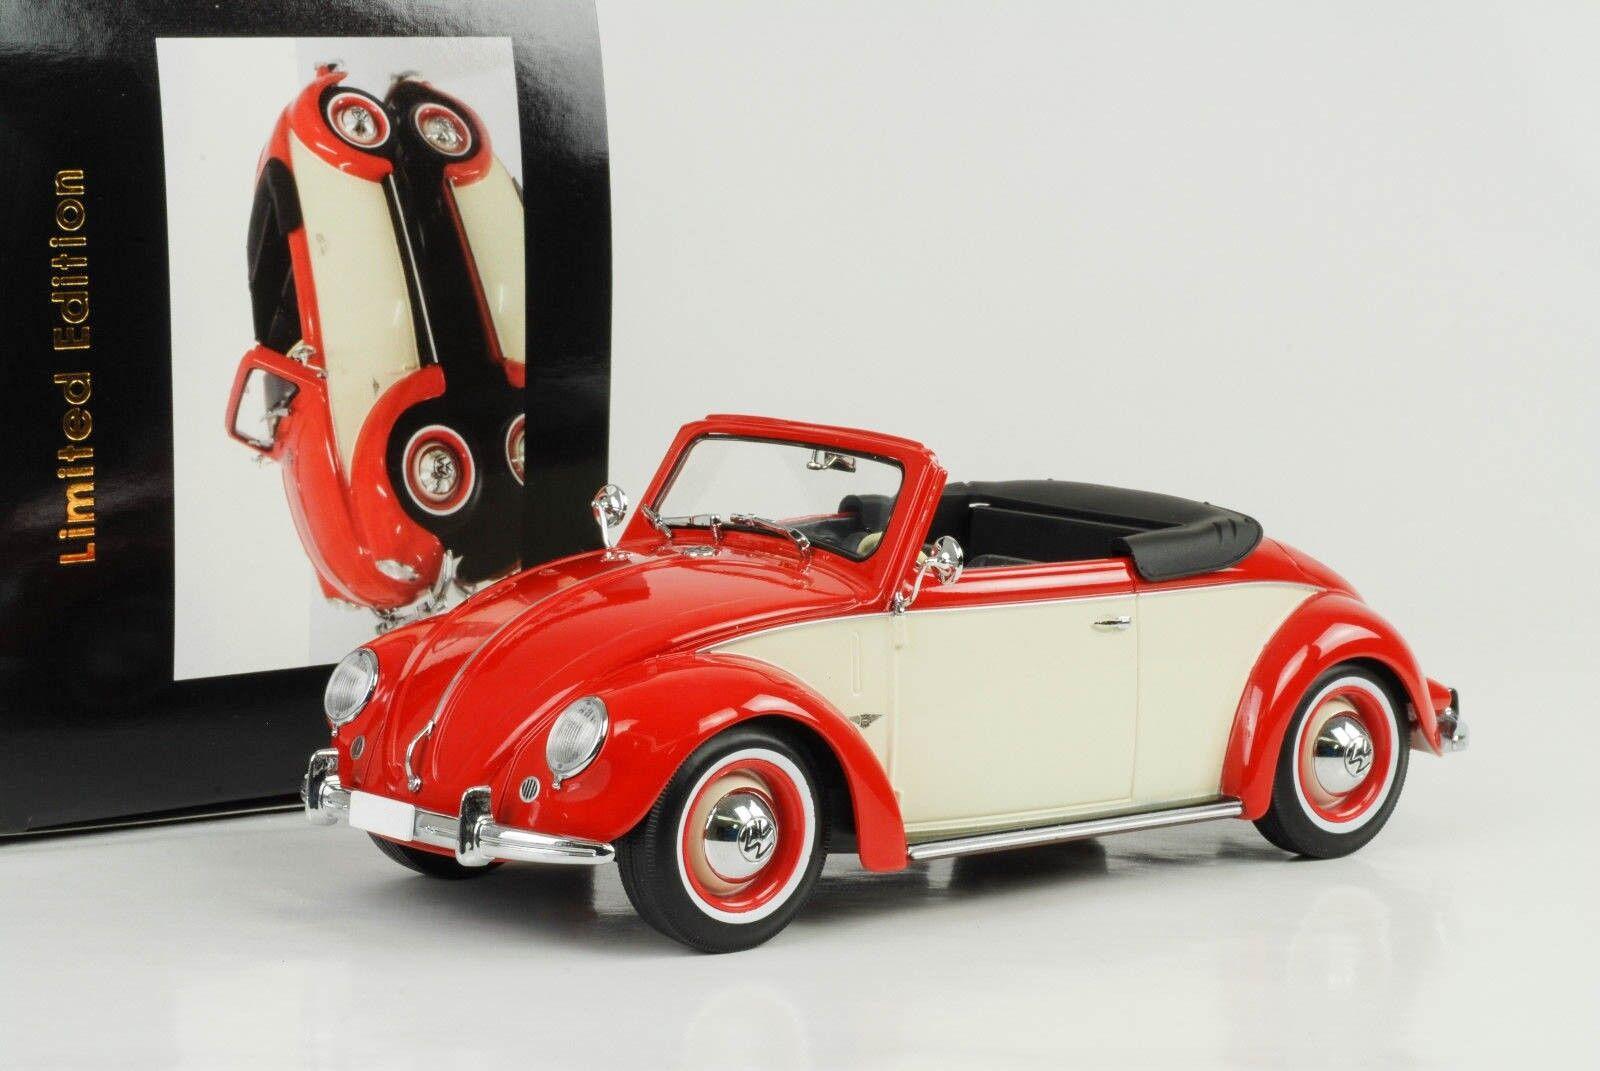 Volkswagen VW 1200 Hebmüller 1949 Cabriolet with Roof Red Cream 1 18 Kk Diecast